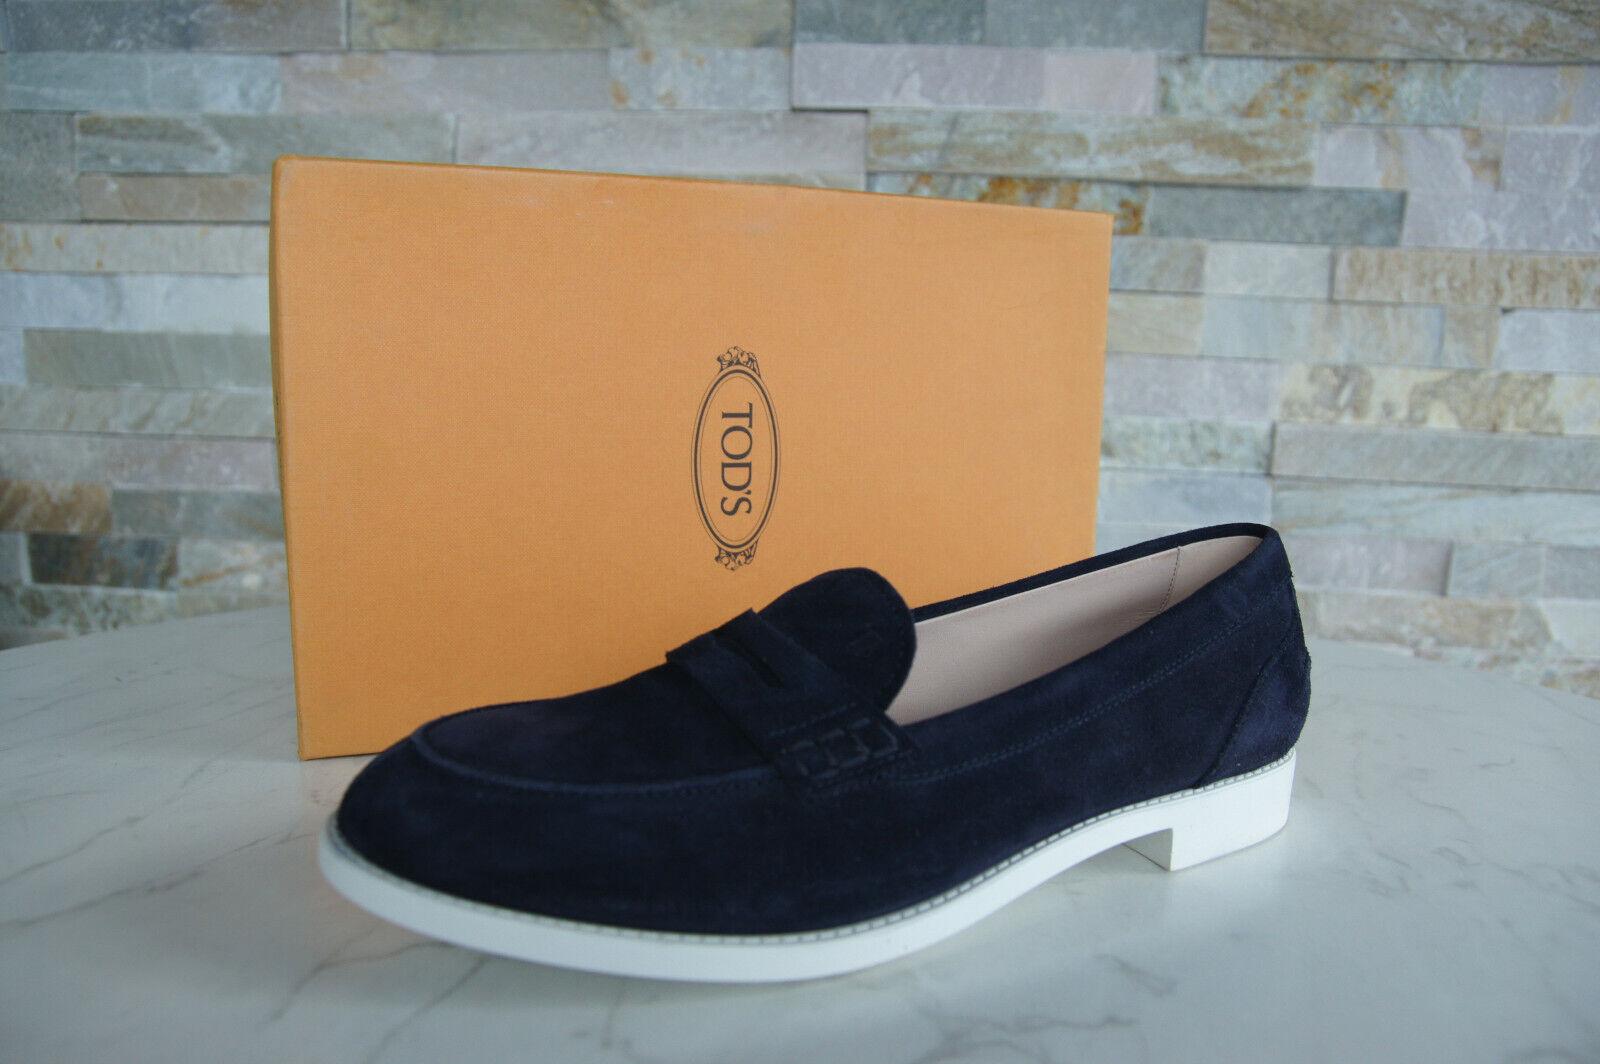 Tods Tod´s Gr 40 Slipper Halbschuhe Loafers Schuhe blau neu ehem